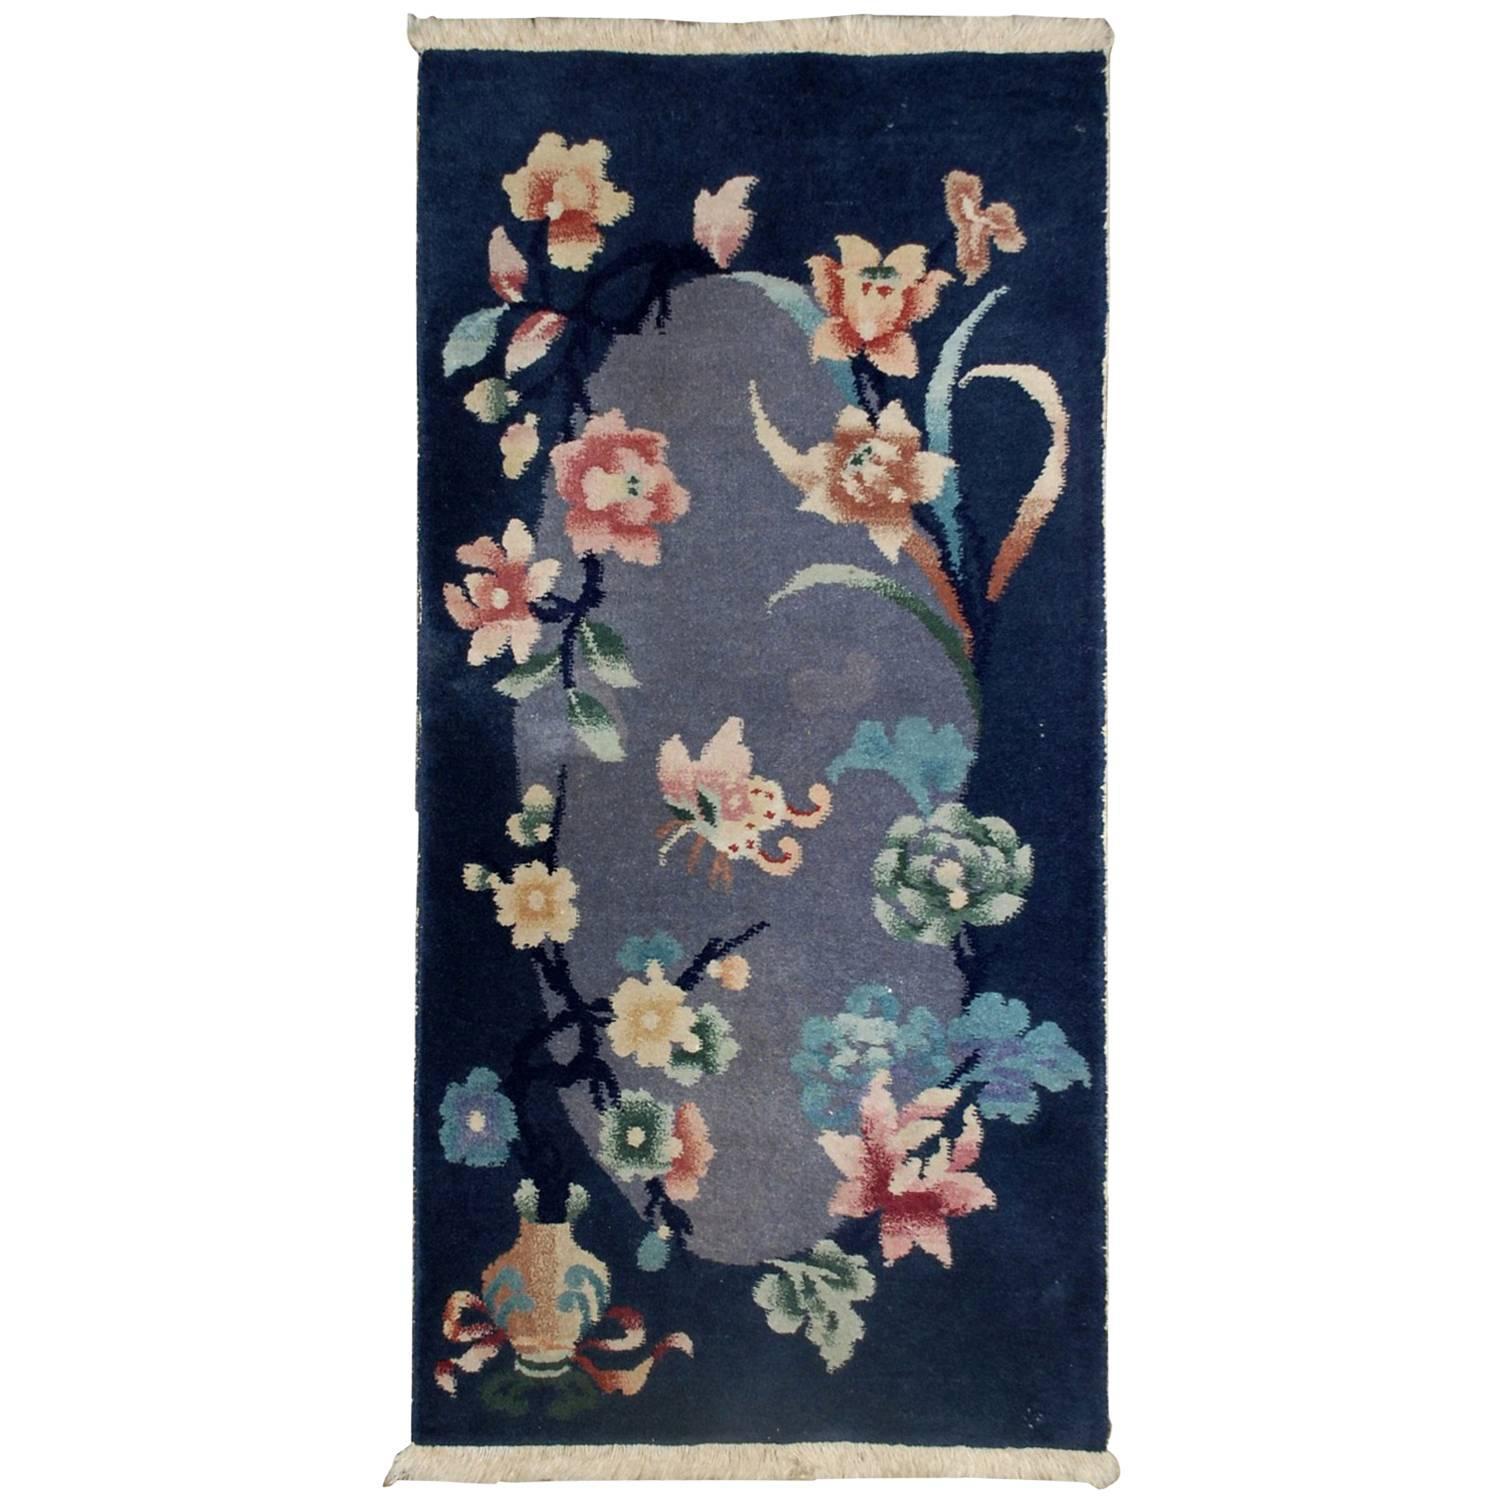 Handmade Antique Art Deco Chinese Rug, 1920s, 1B530